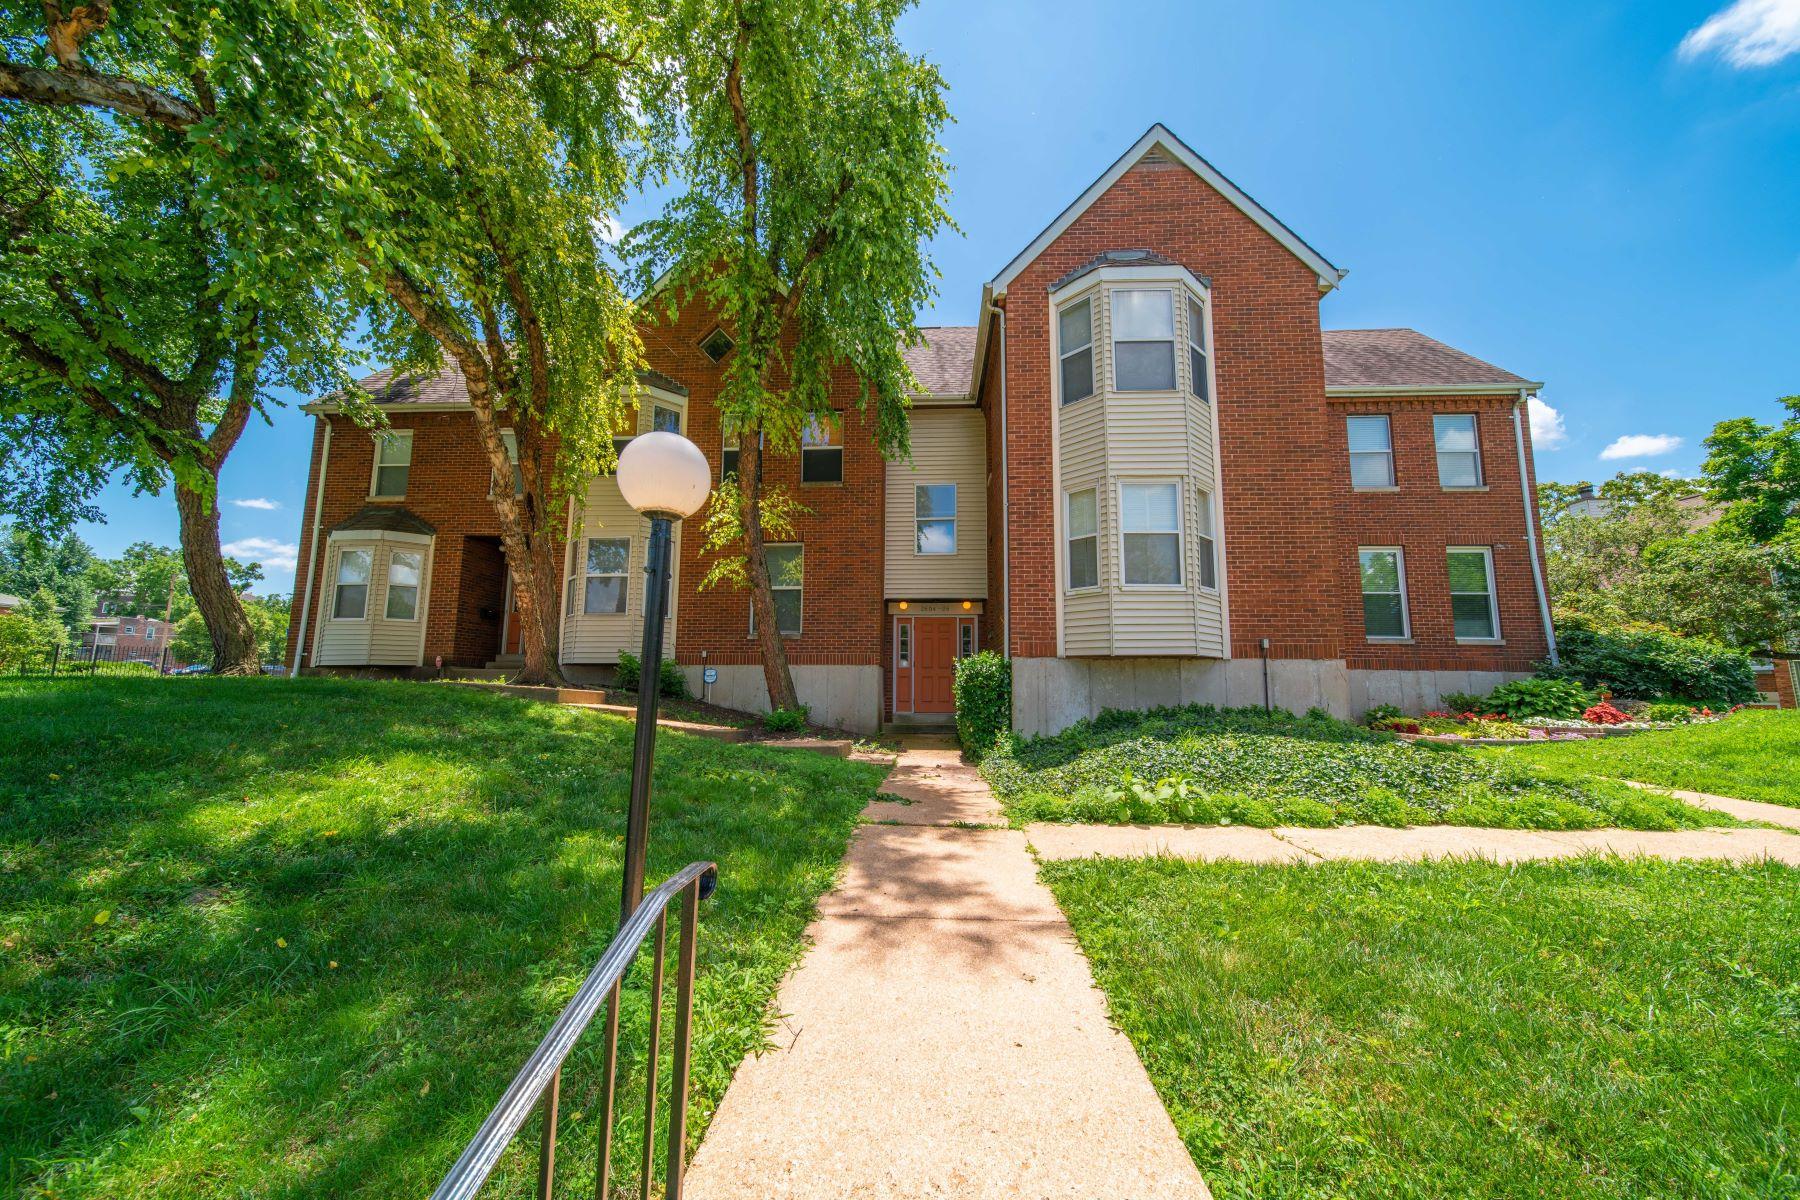 Condominiums for Sale at Central East Condo Close to SLU 2606 Park Avenue C2 St. Louis, Missouri 63104 United States